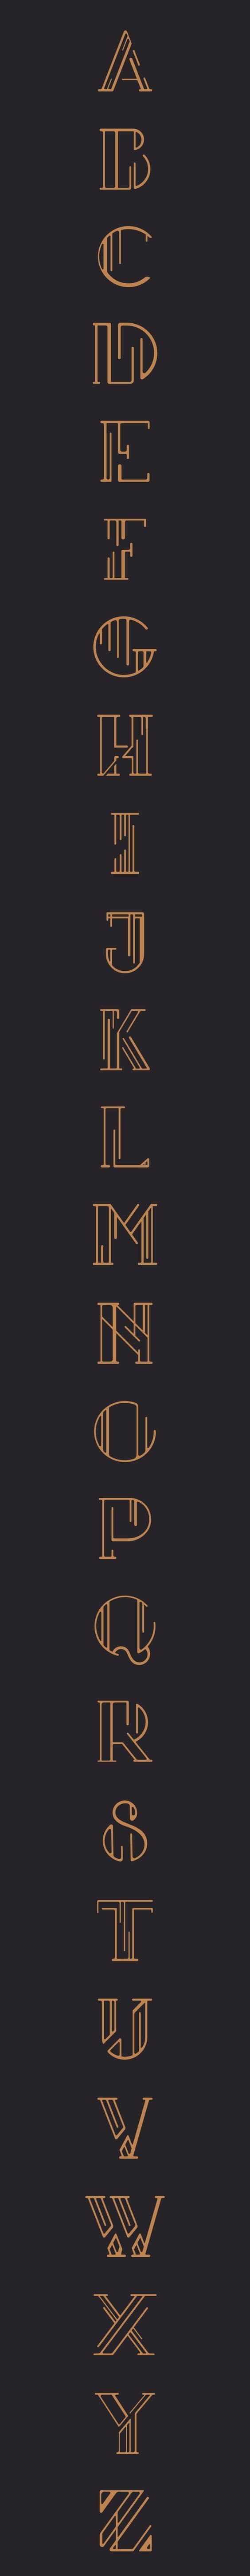 Insomnia deco creative art deco style font calligraphysymbols insomnia deco creative art deco style font buycottarizona